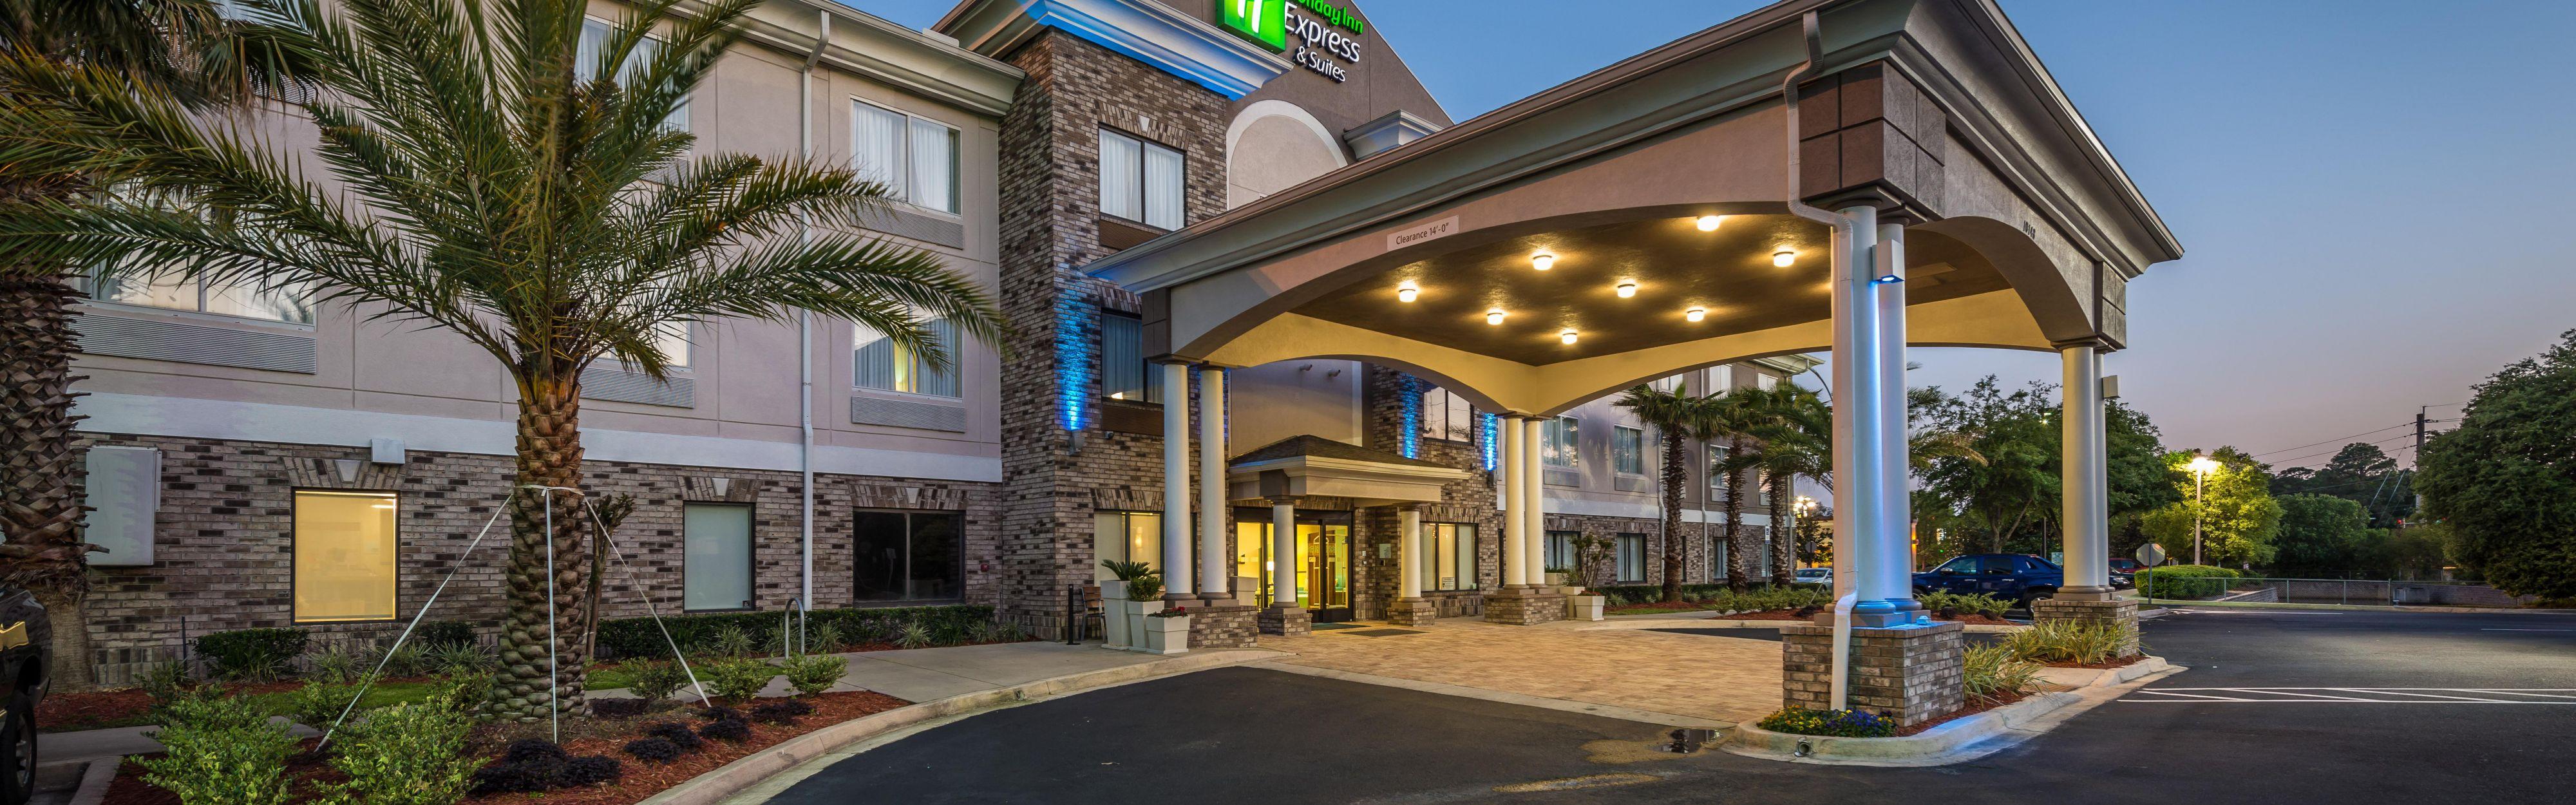 Holiday Inn Express & Suites Jacksonville - Blount Island image 0